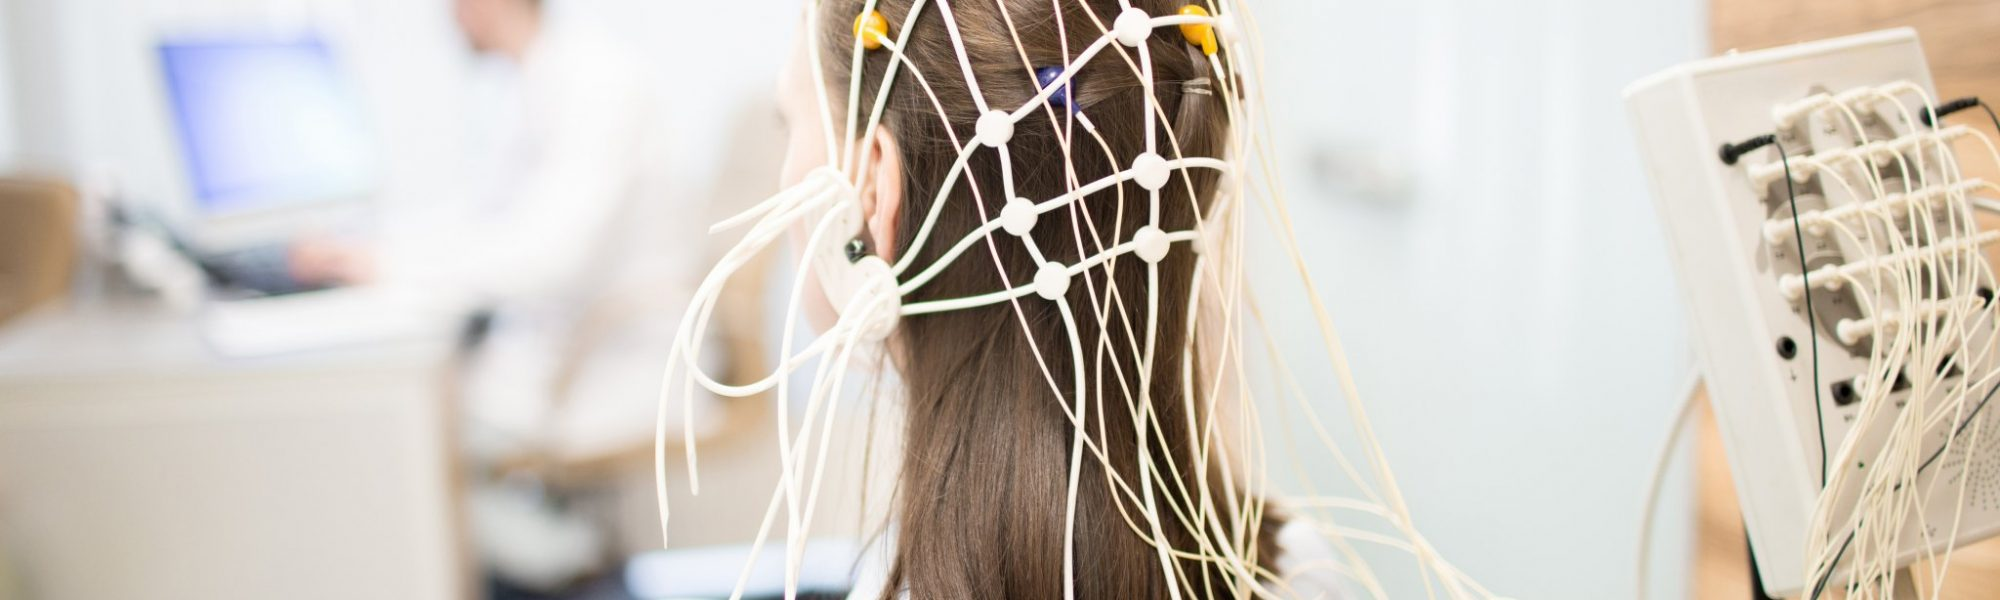 EEG in der Neuropraxis Nürnberg